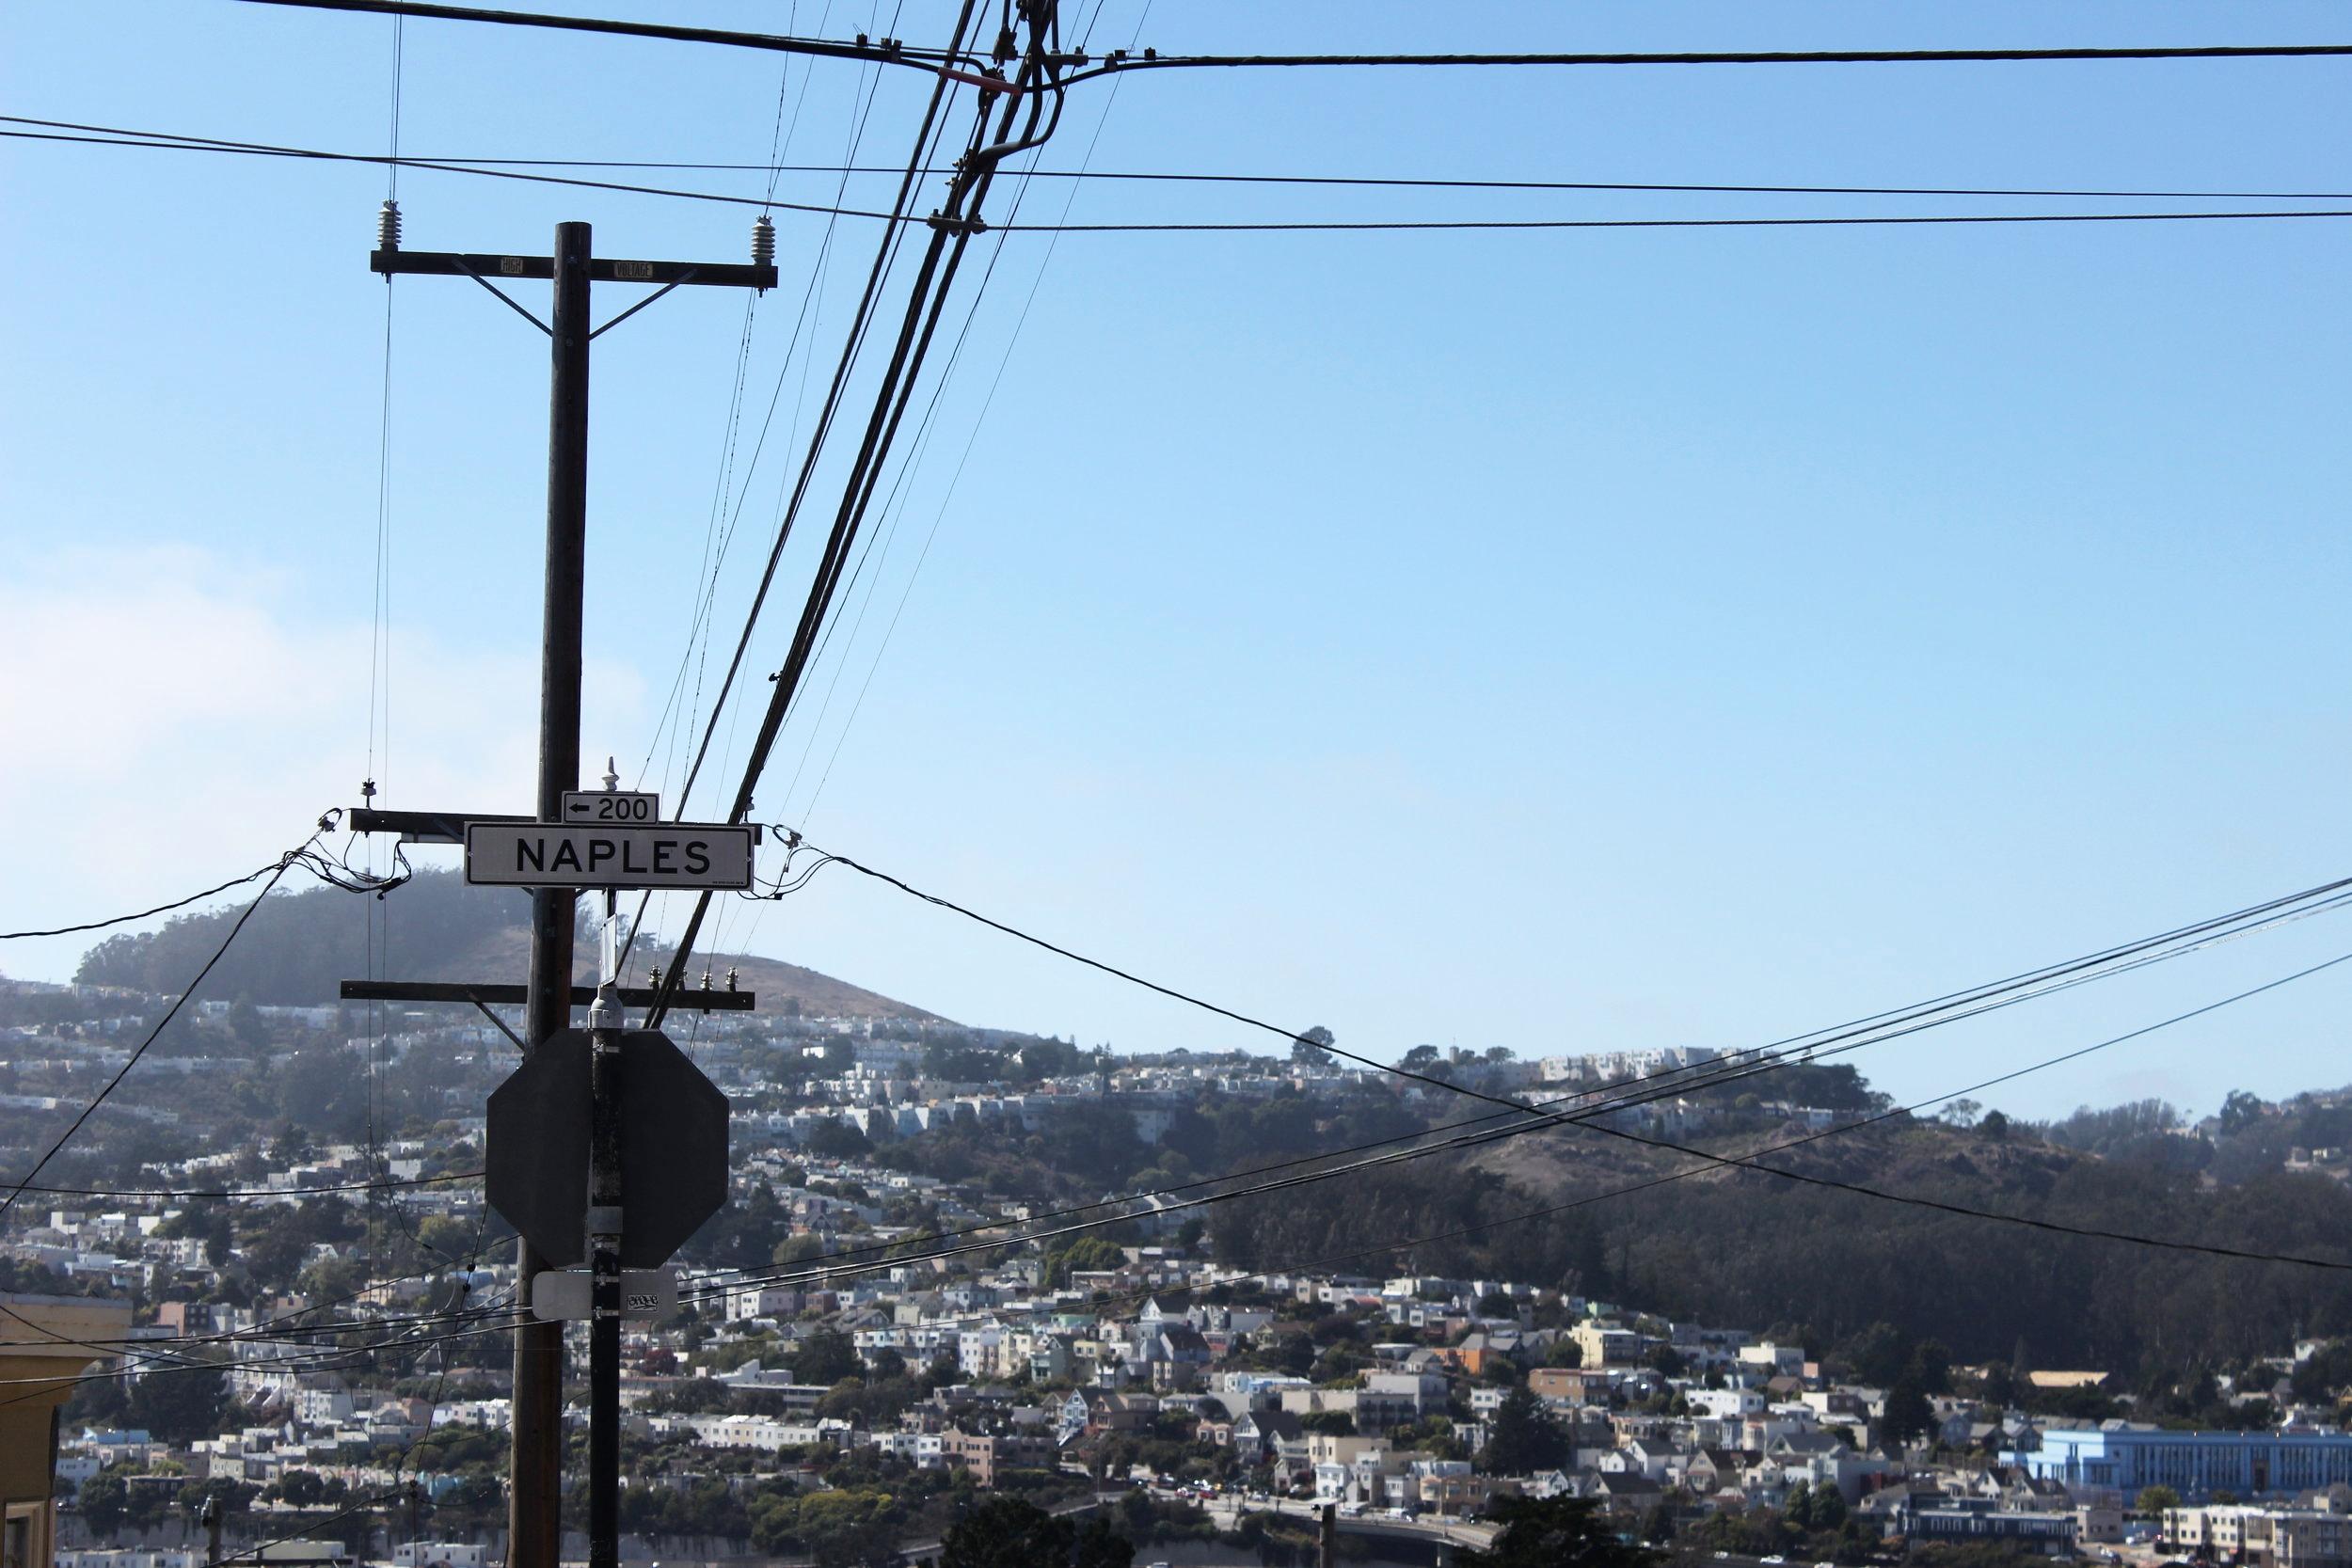 @San Francisco